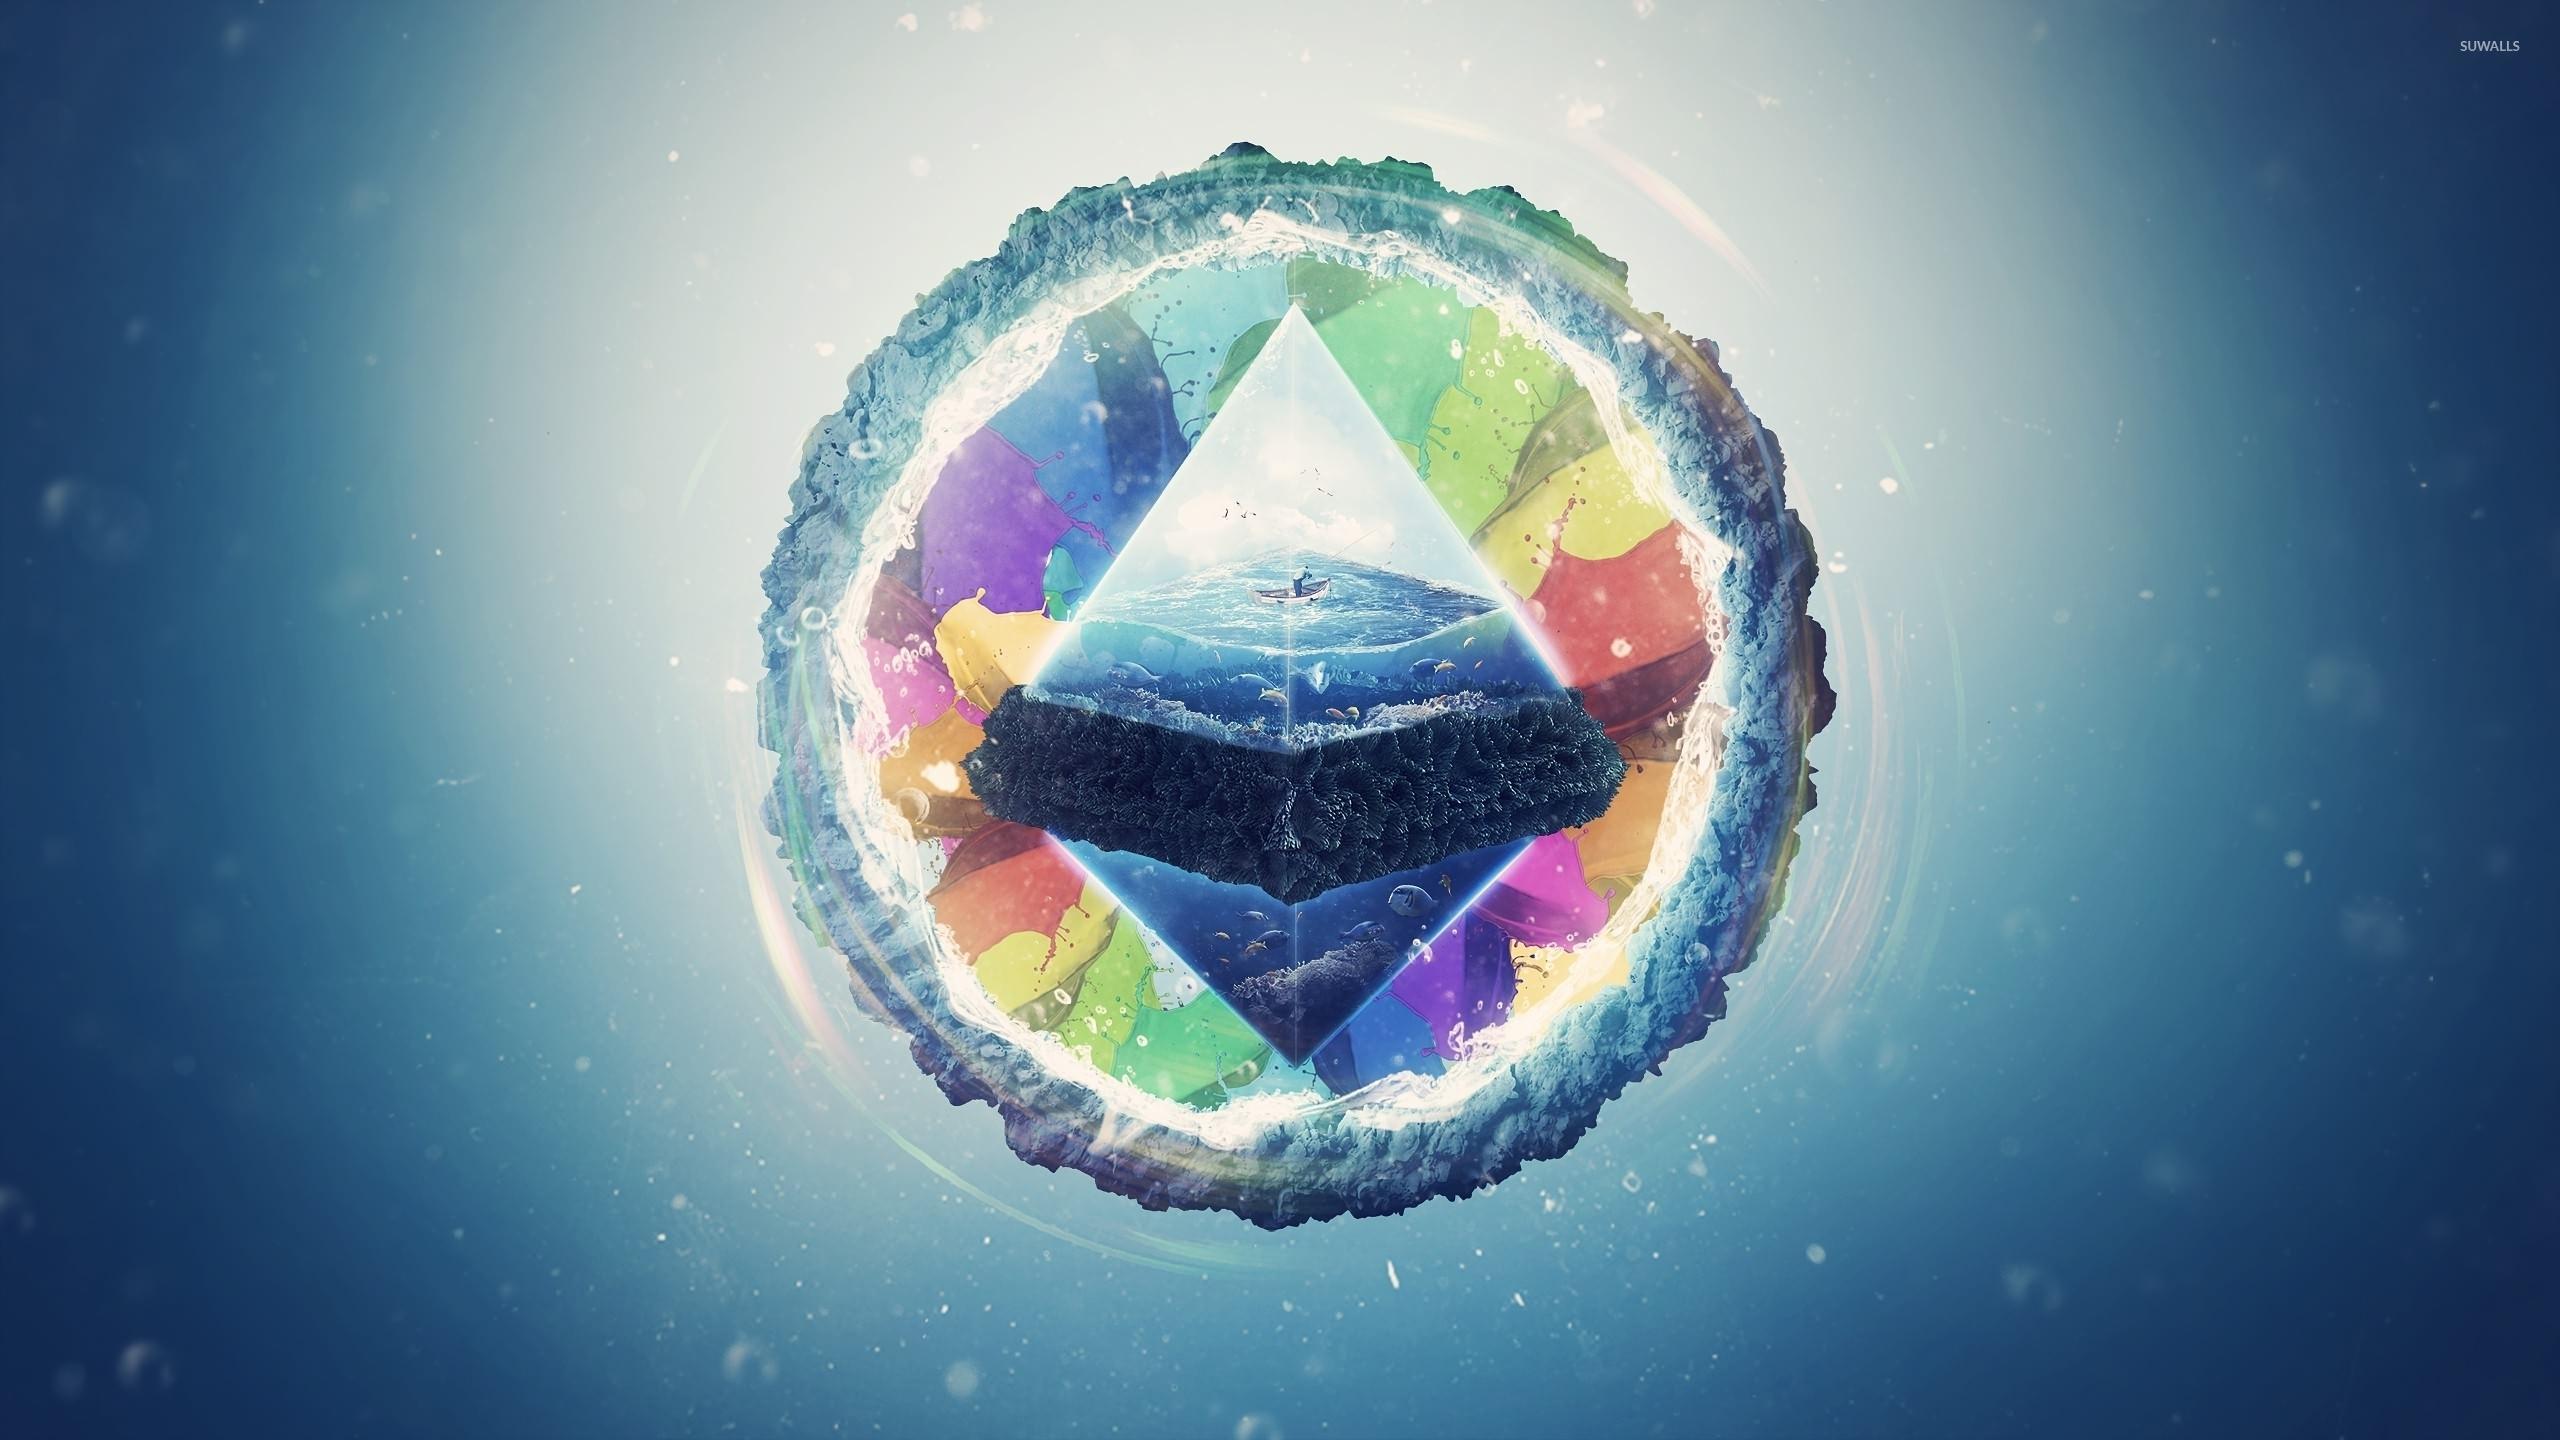 World Inside The Pyramid Wallpaper